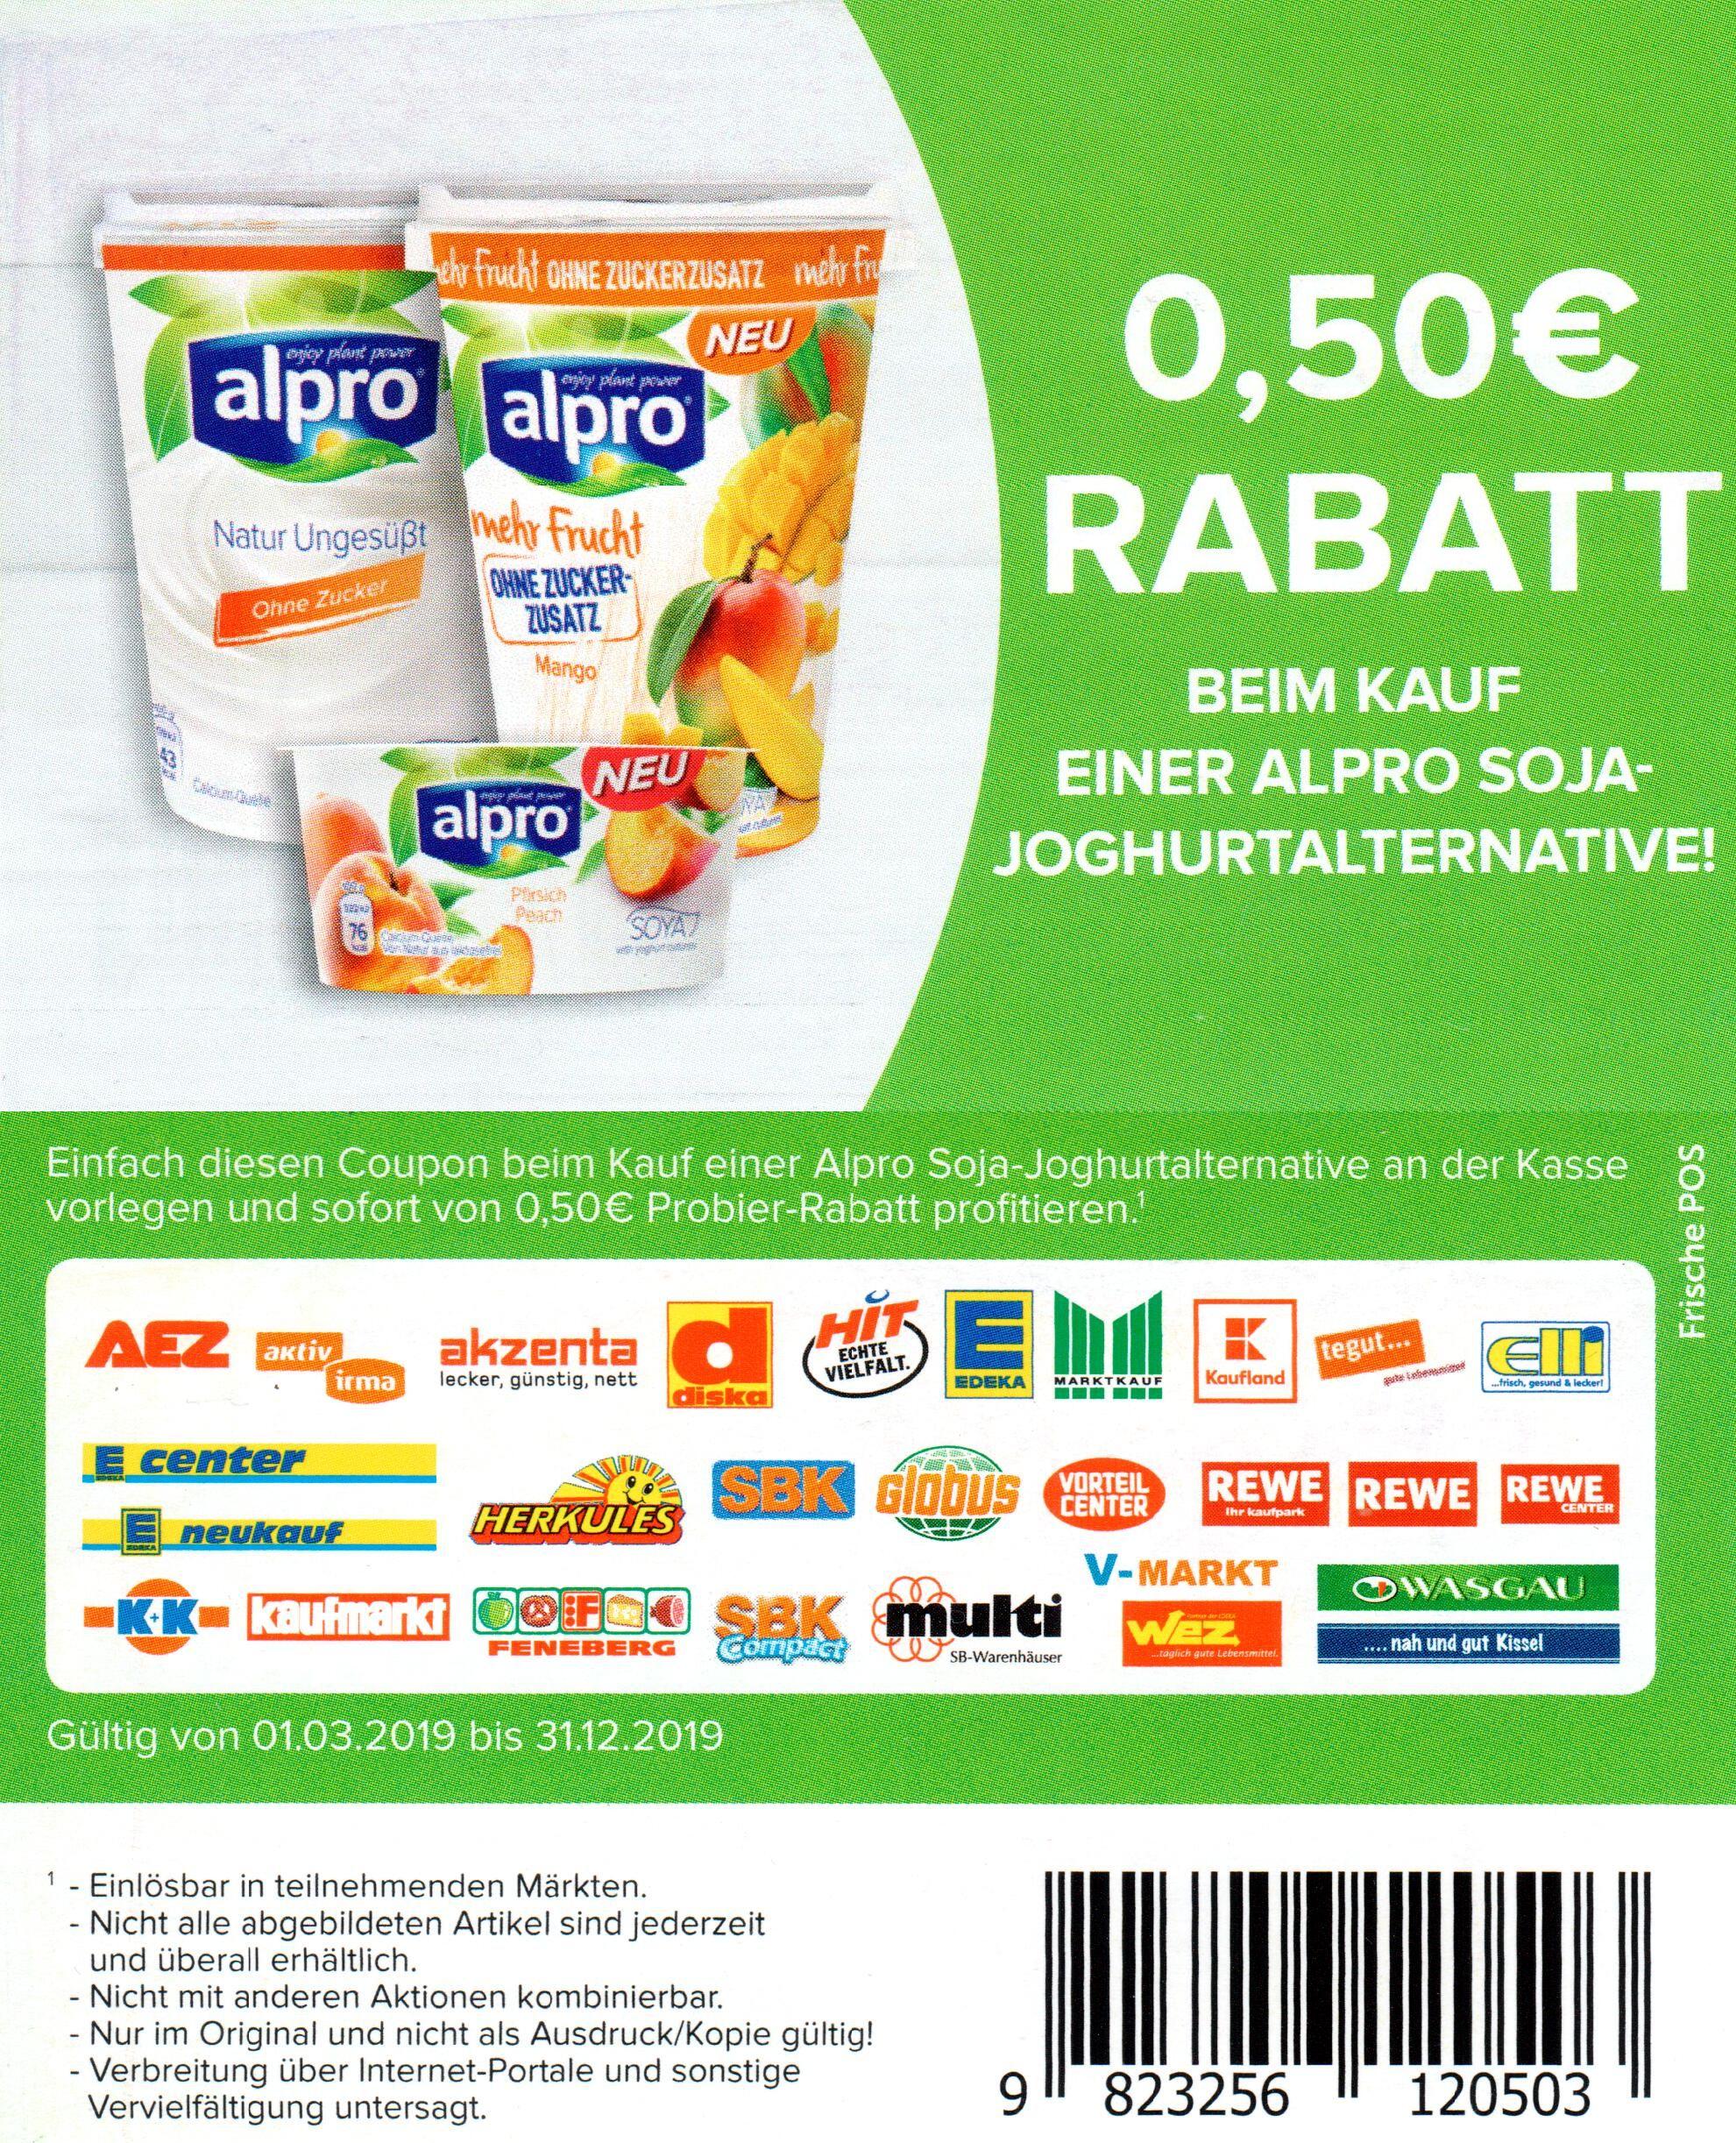 0,50€ Sofort-Rabatt Coupons für Alpro Soja-Joghurtalternative oder Skyr Style bis 31.12.2019